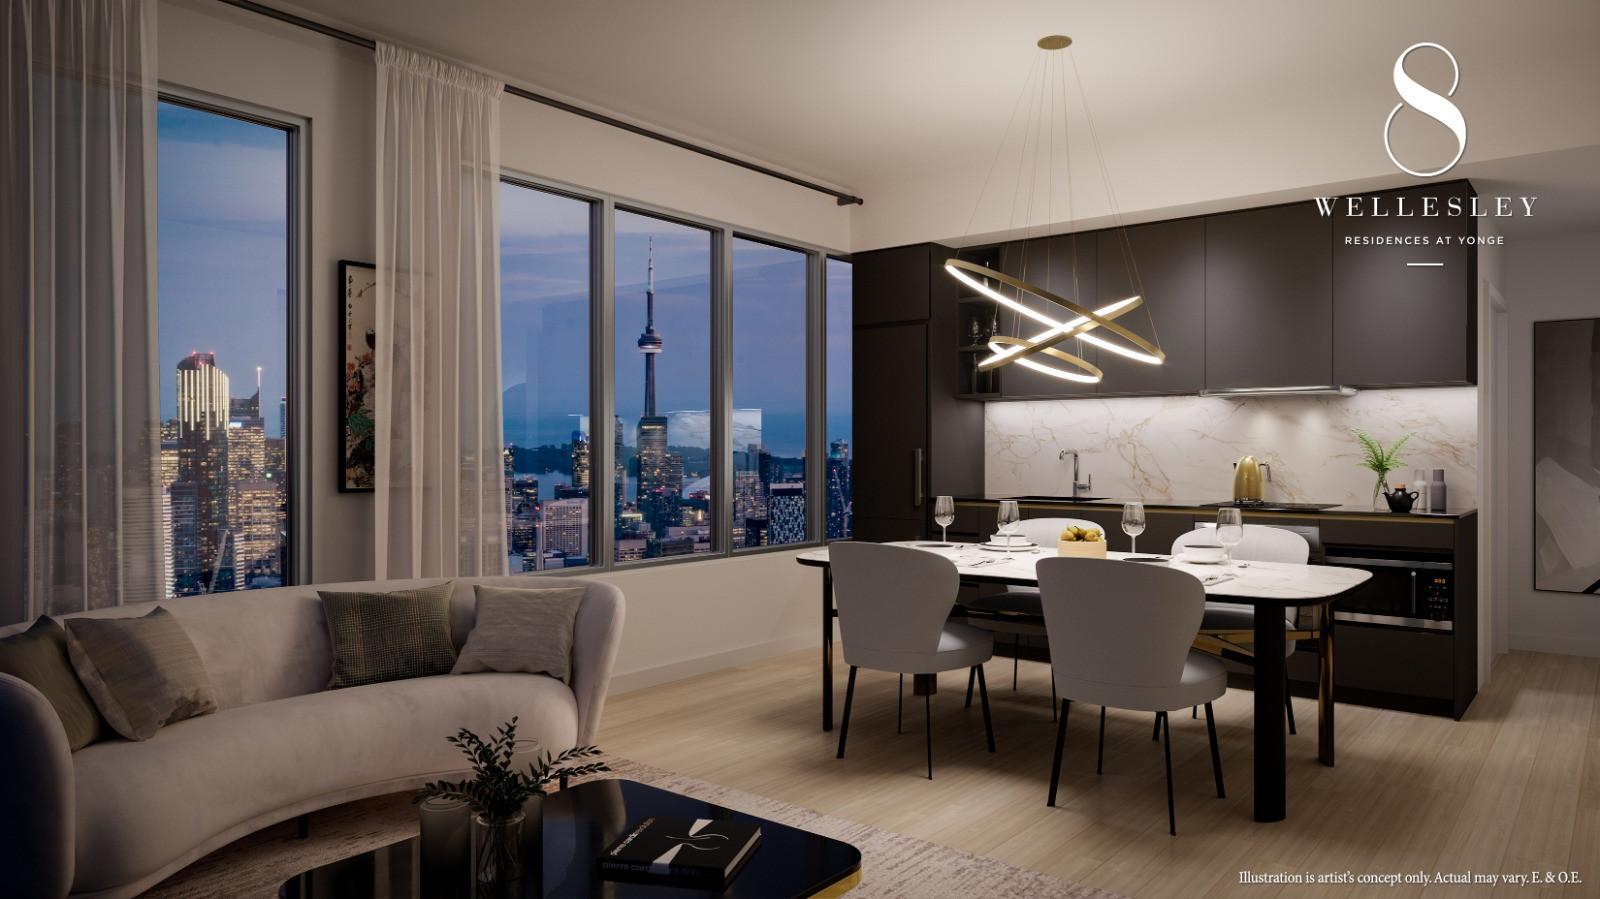 8 Wellesley Suite Interior -Enigmatic Pa